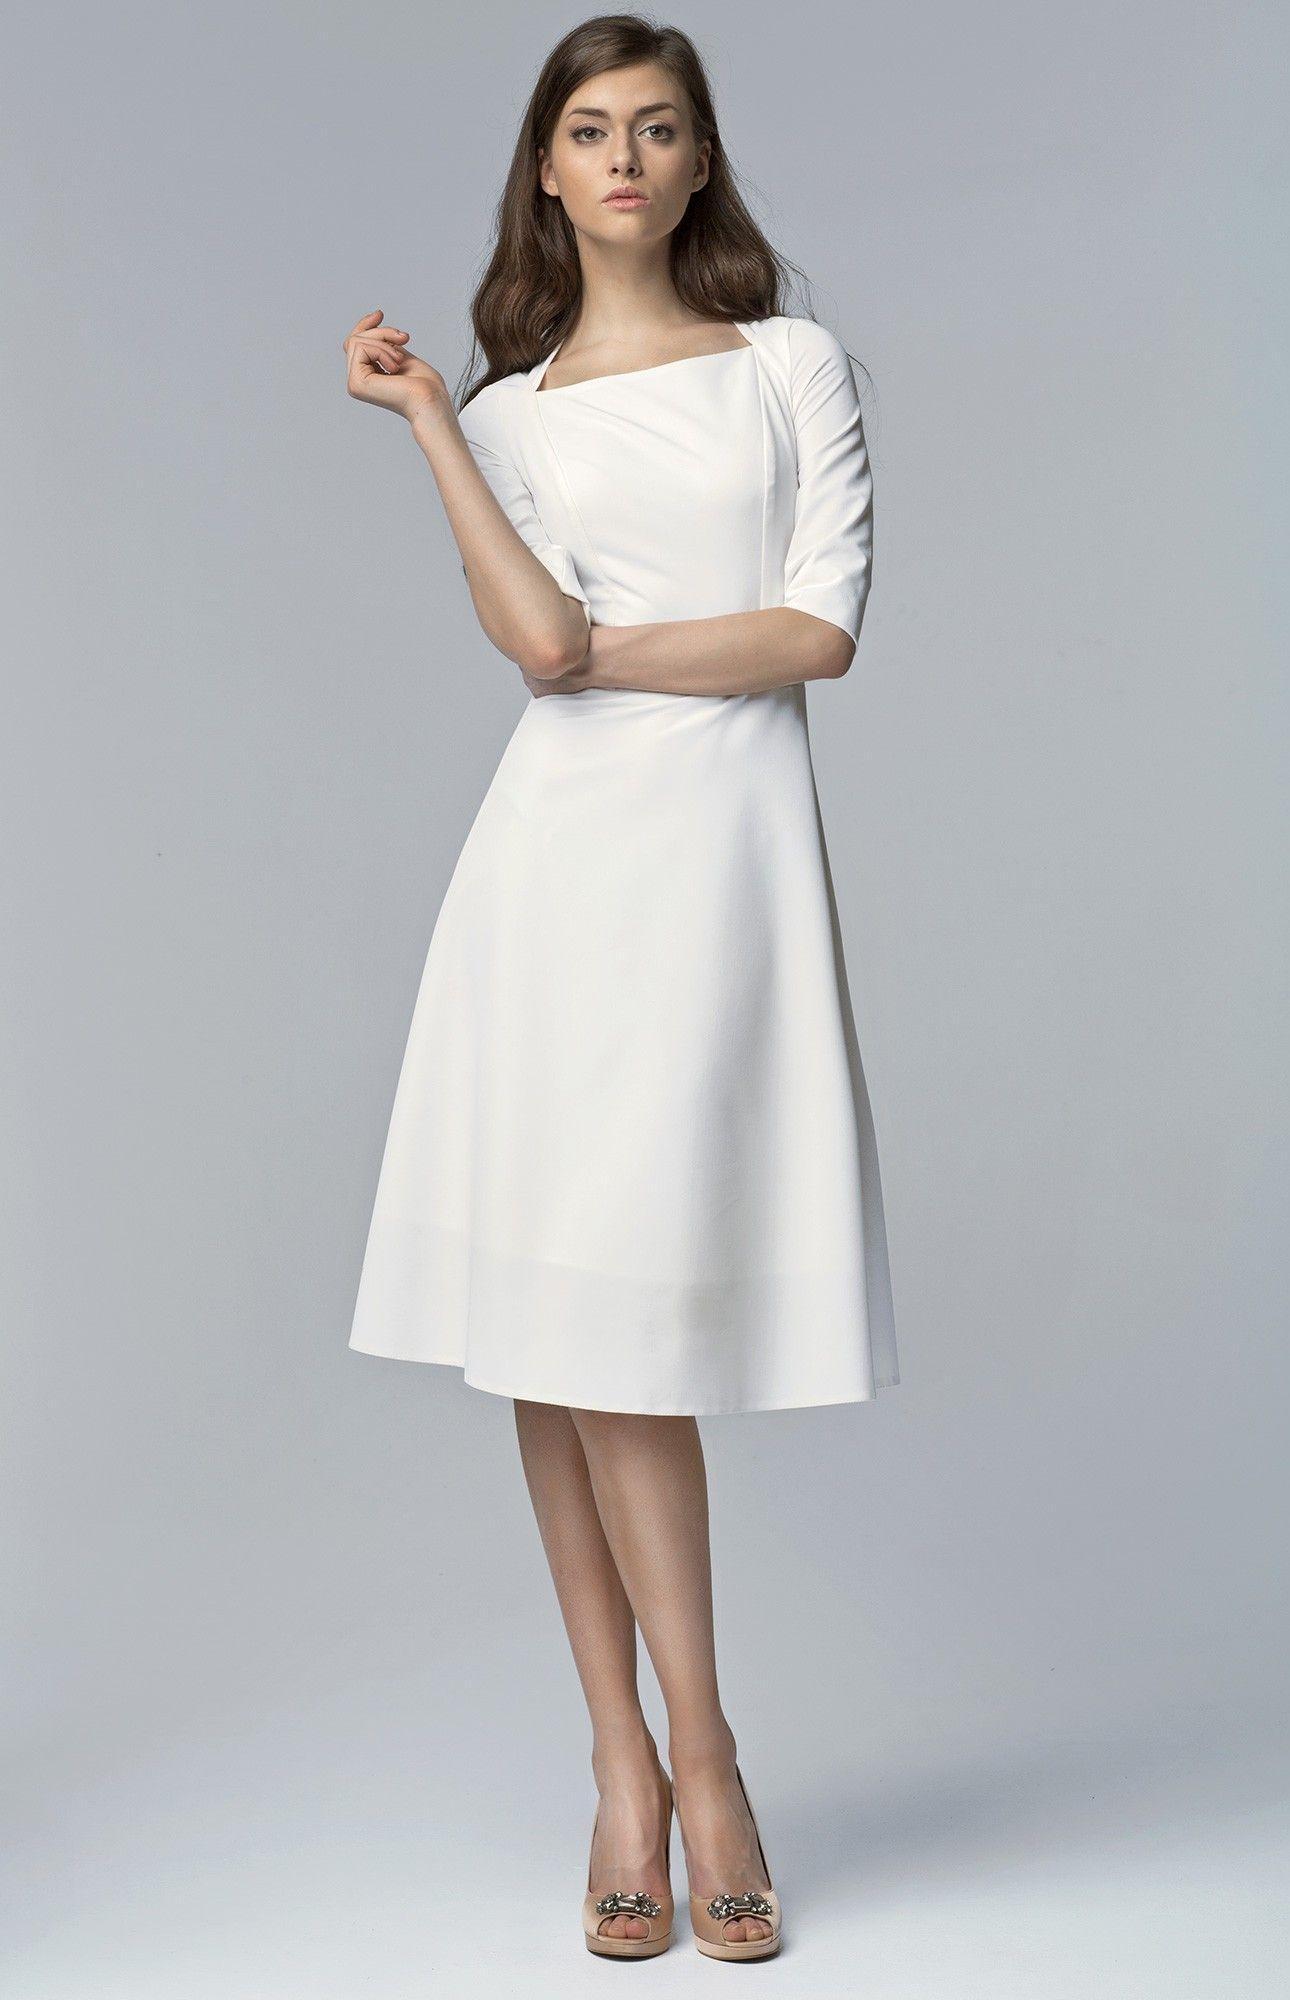 bef6e3428f7 Charmante robe chic écru parfaite pour toute occasion